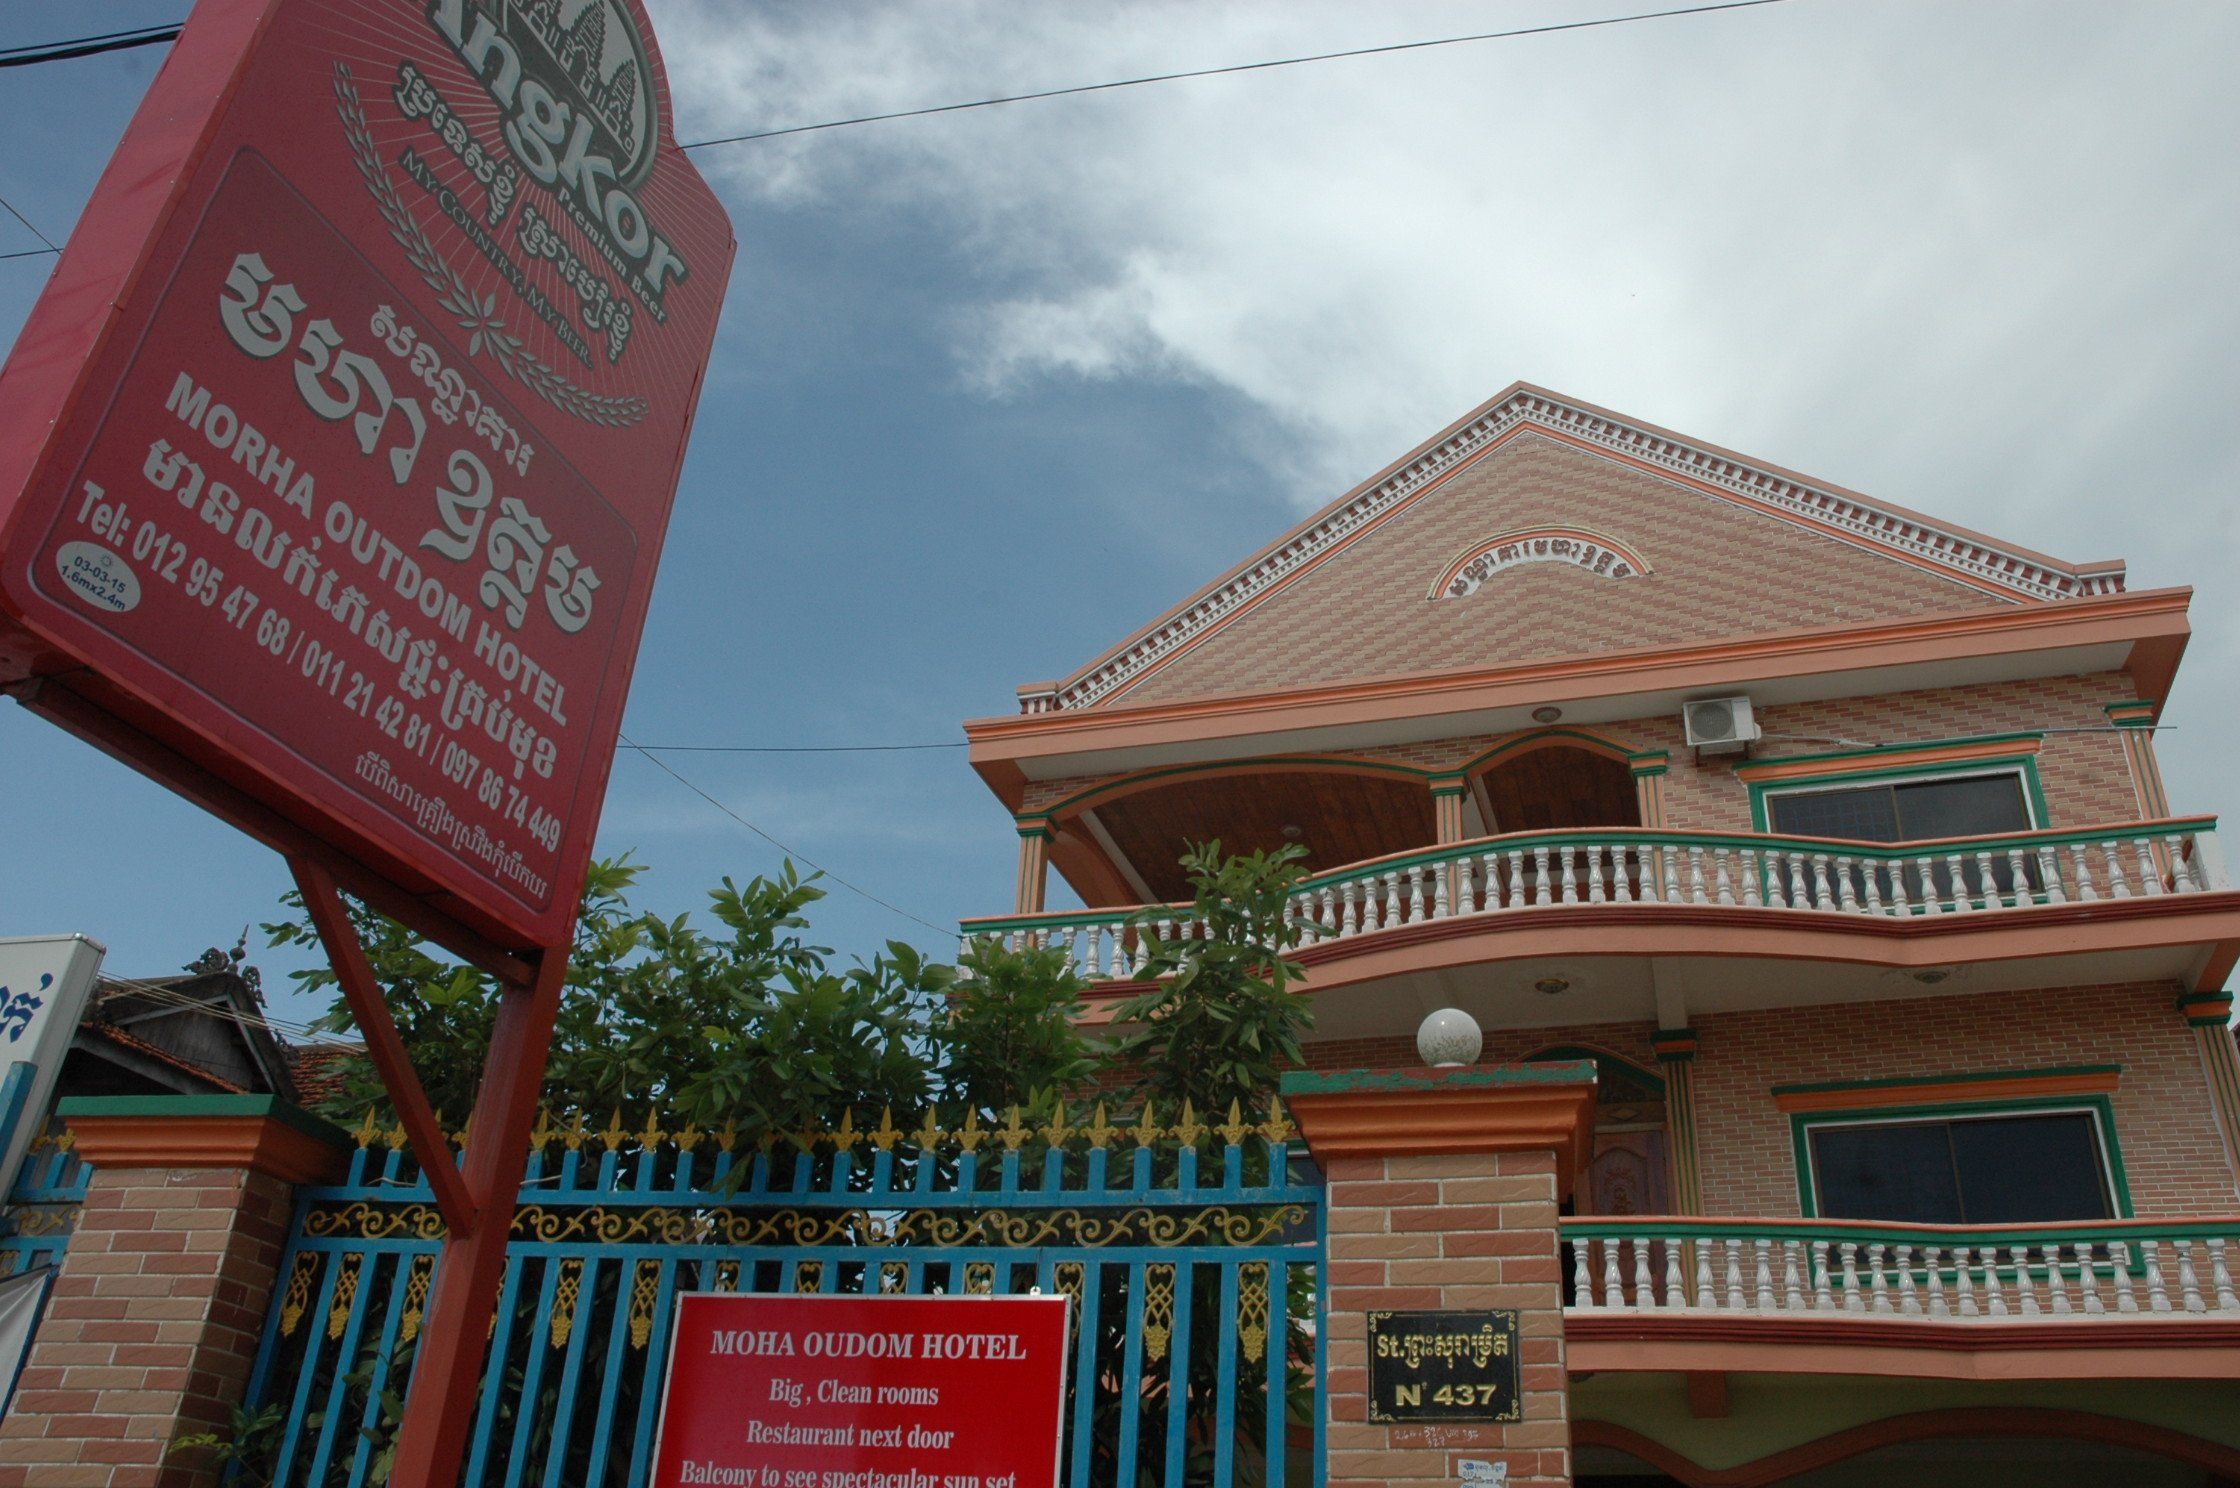 Moha Oudom Hotel